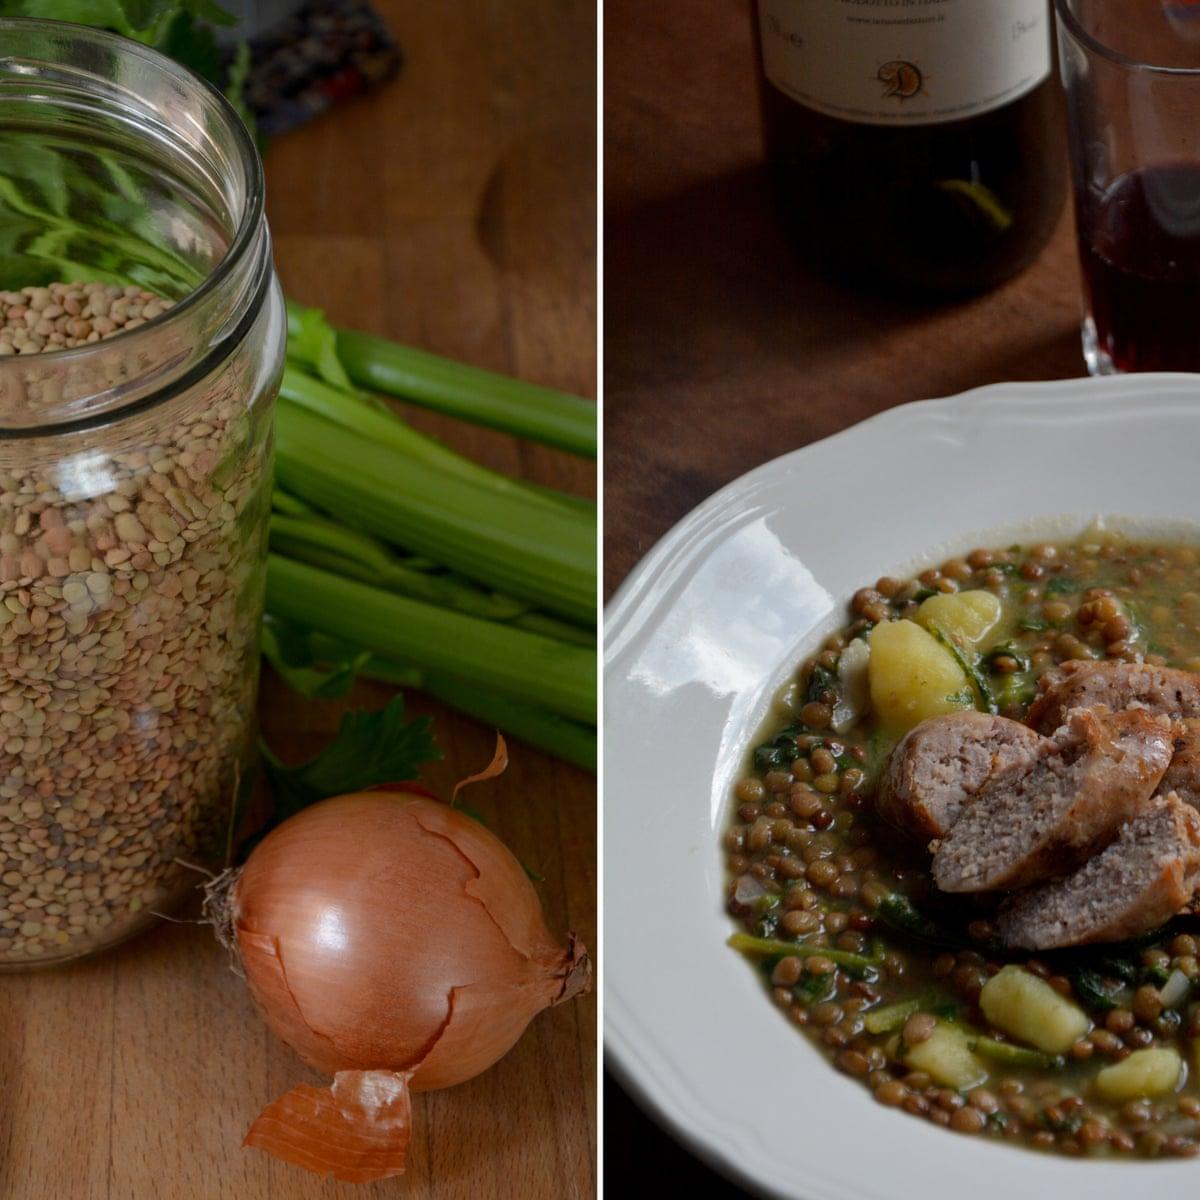 Rachel Roddy S Italian Recipes For Lockdown Food The Guardian